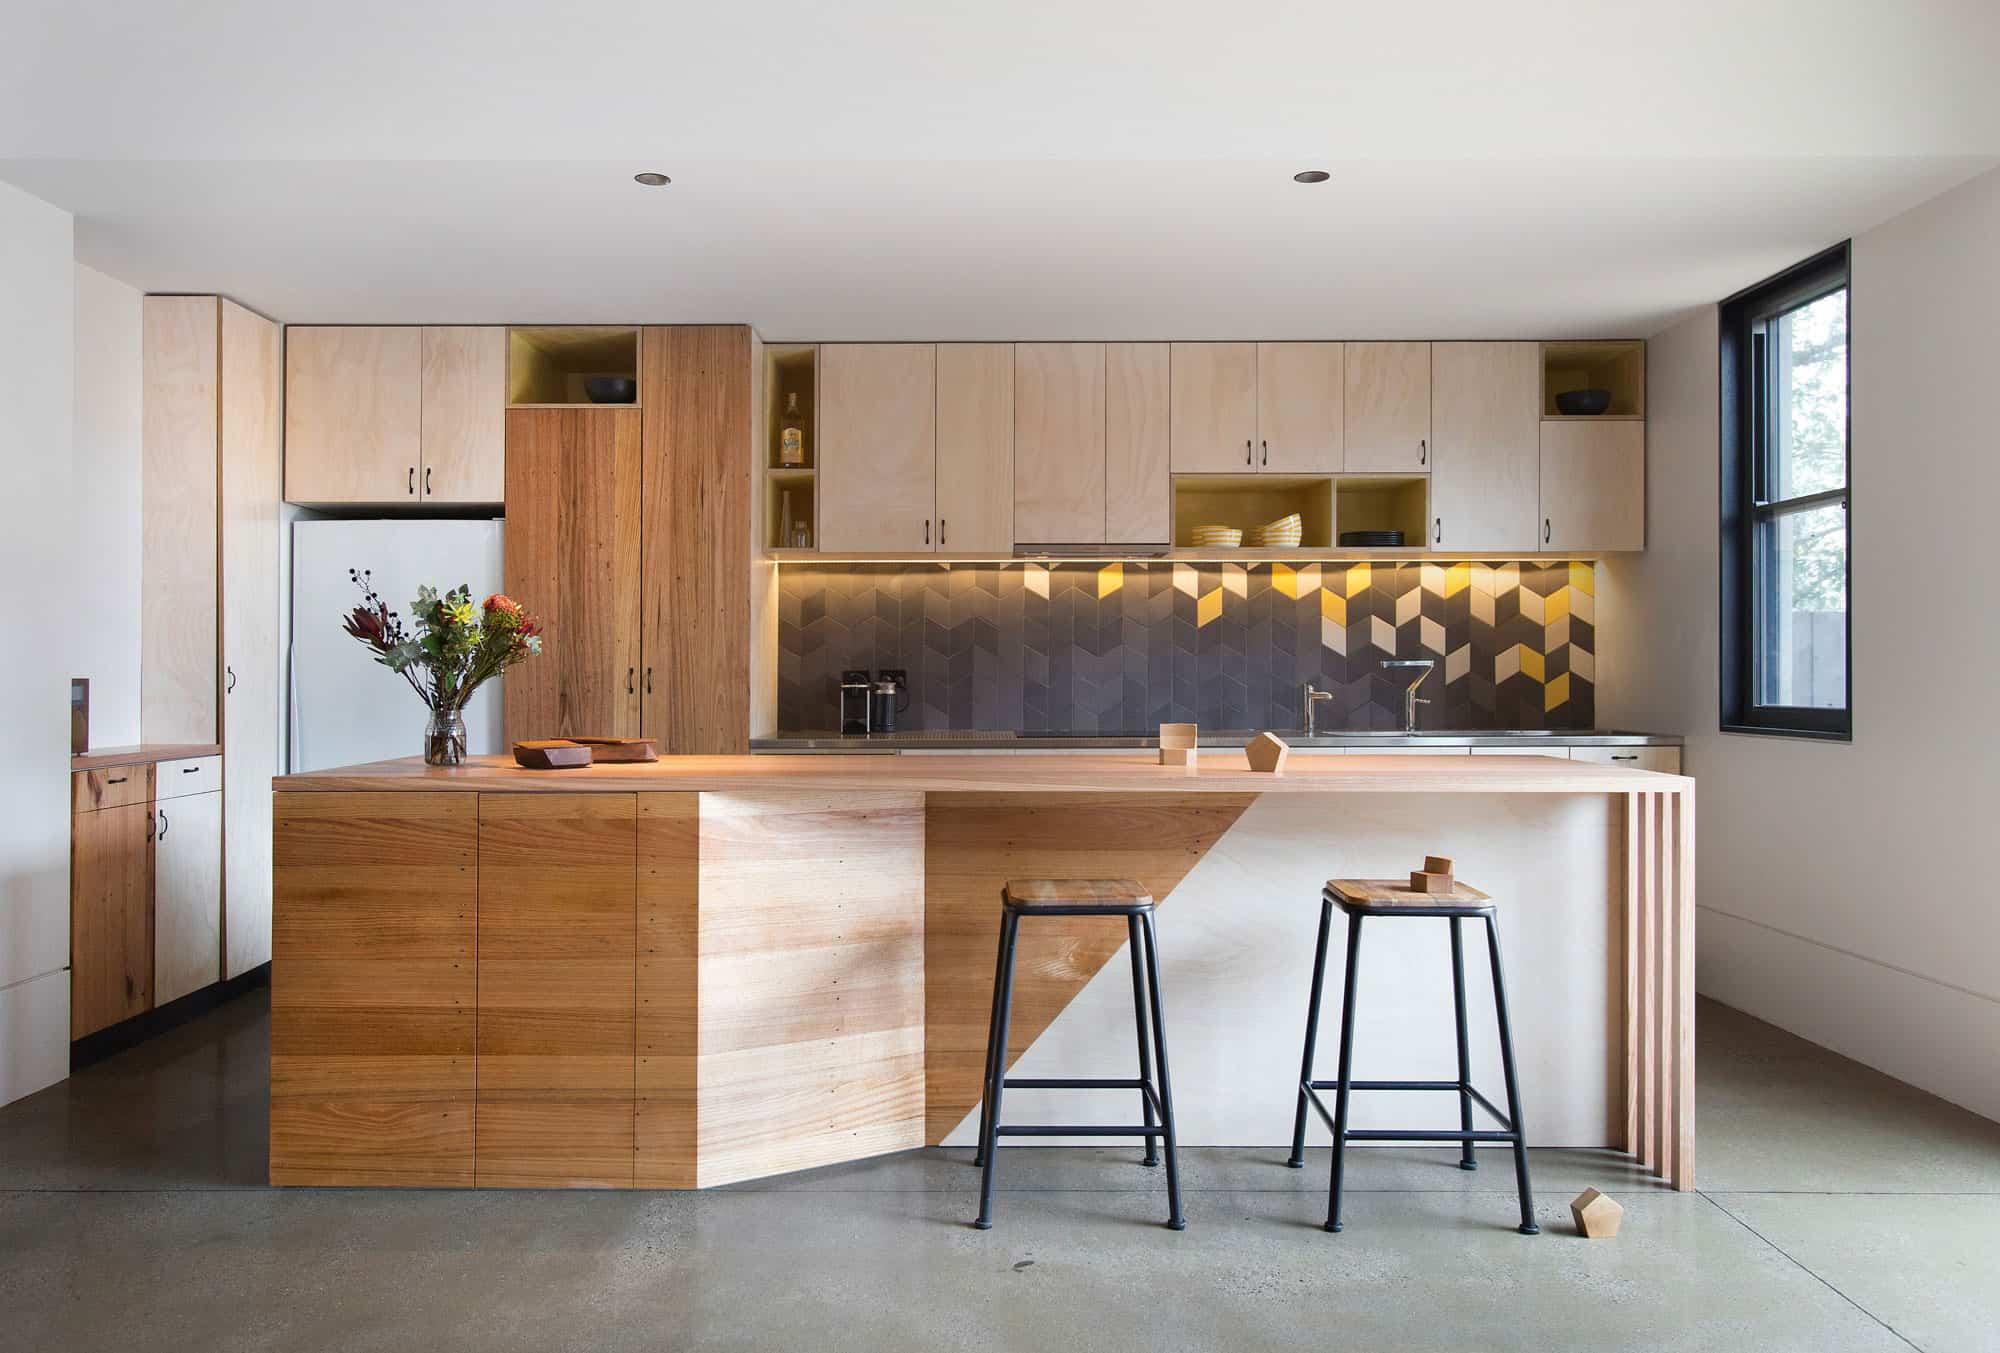 photo gallery looking for a custom kitchen design kitchen design